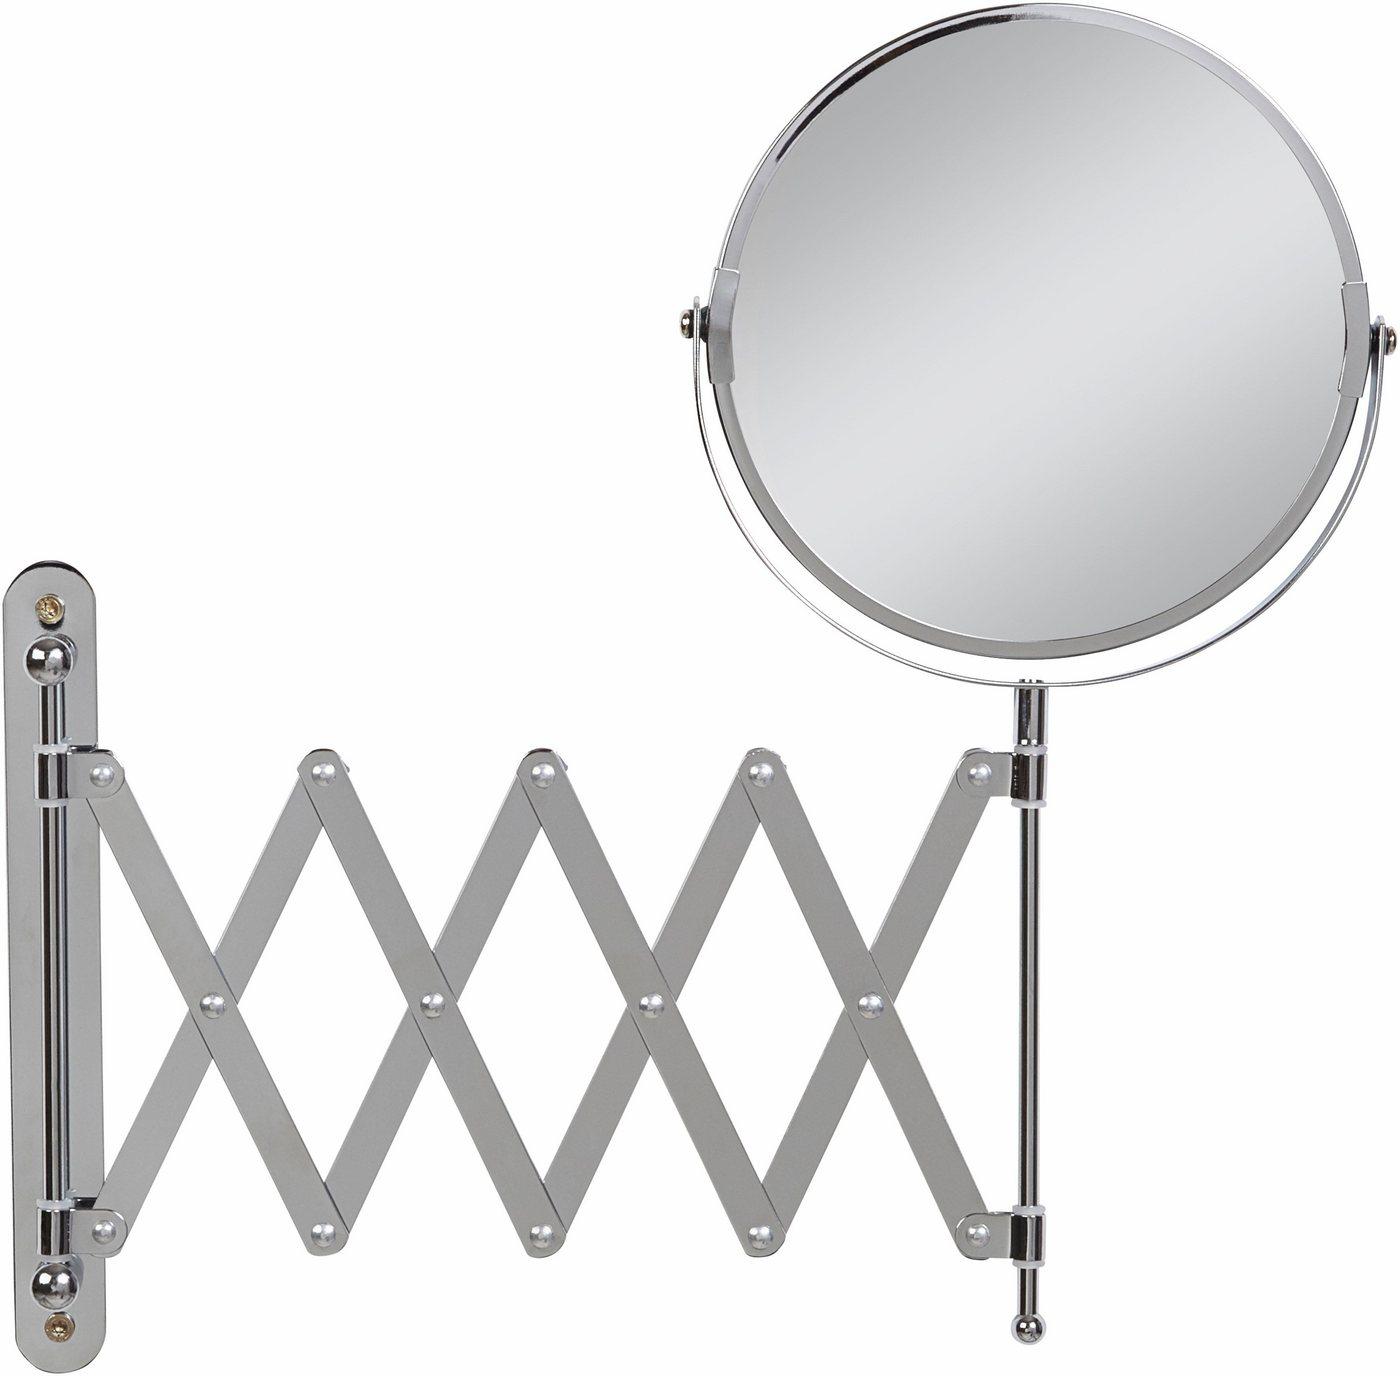 Express Solutions Kosmetikspiegel   Bad > Bad-Accessoires > Kosmetikspiegel   Grau   Express Solutions